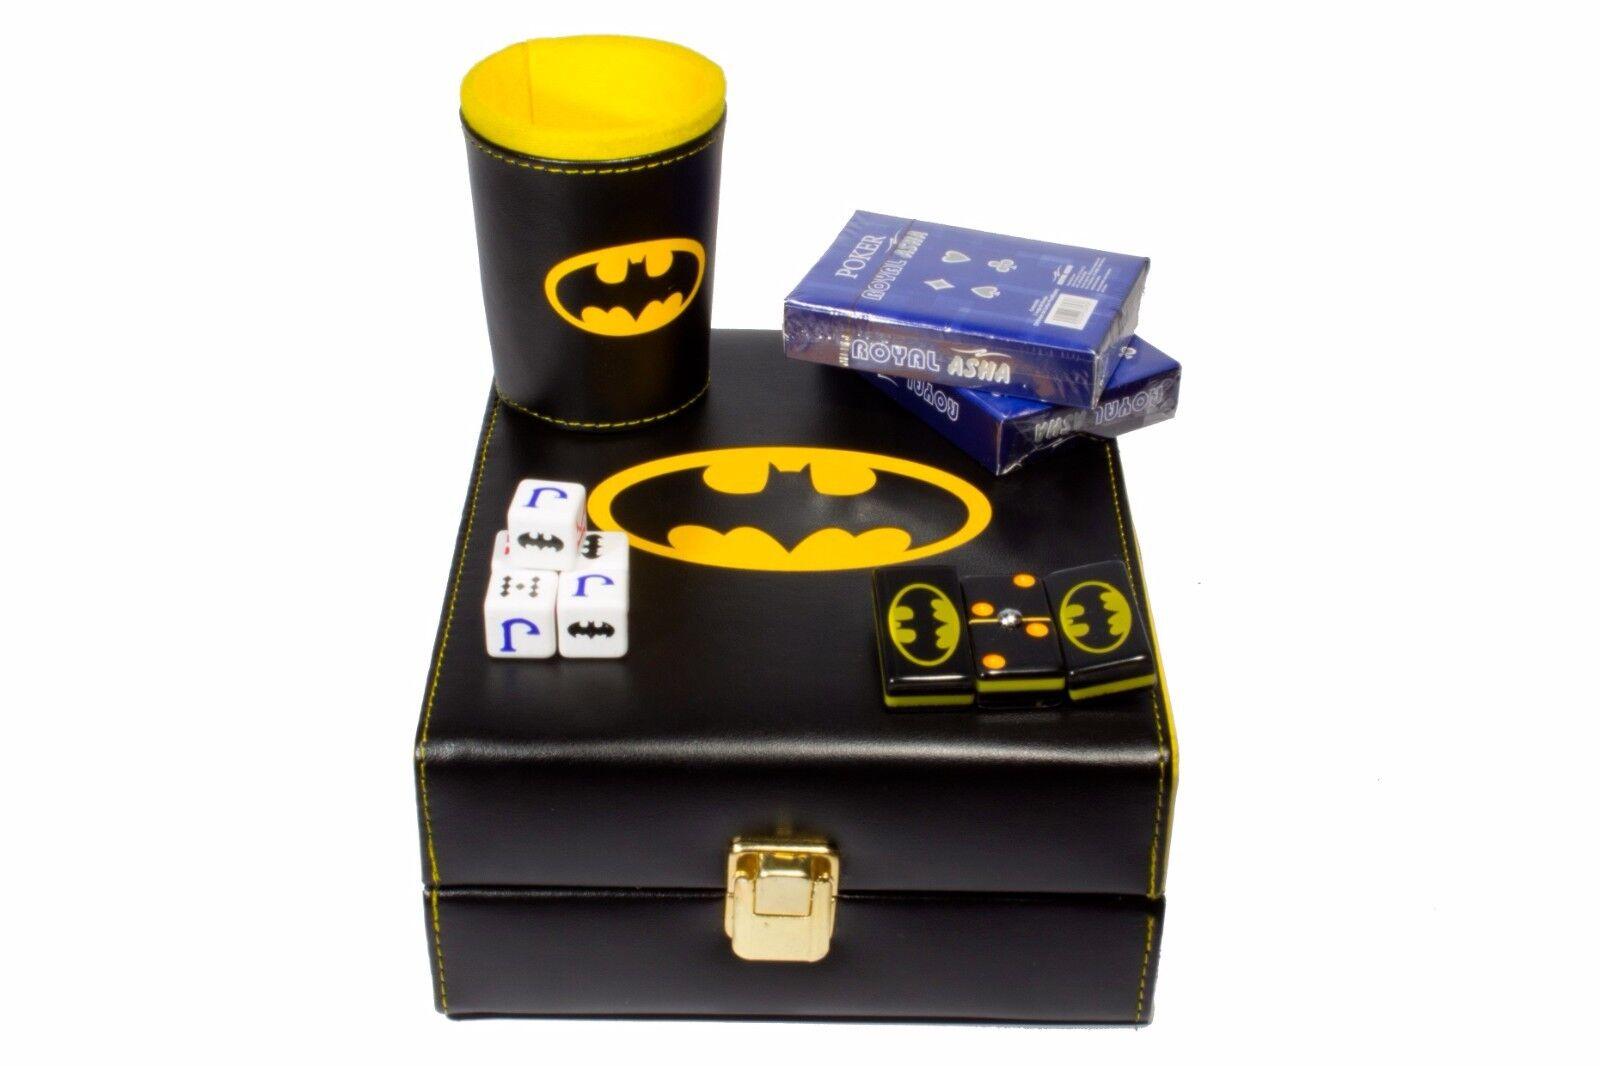 Batman Deluxe Set 3 Games  Domino, Dice Cup, 2 Poker Cards